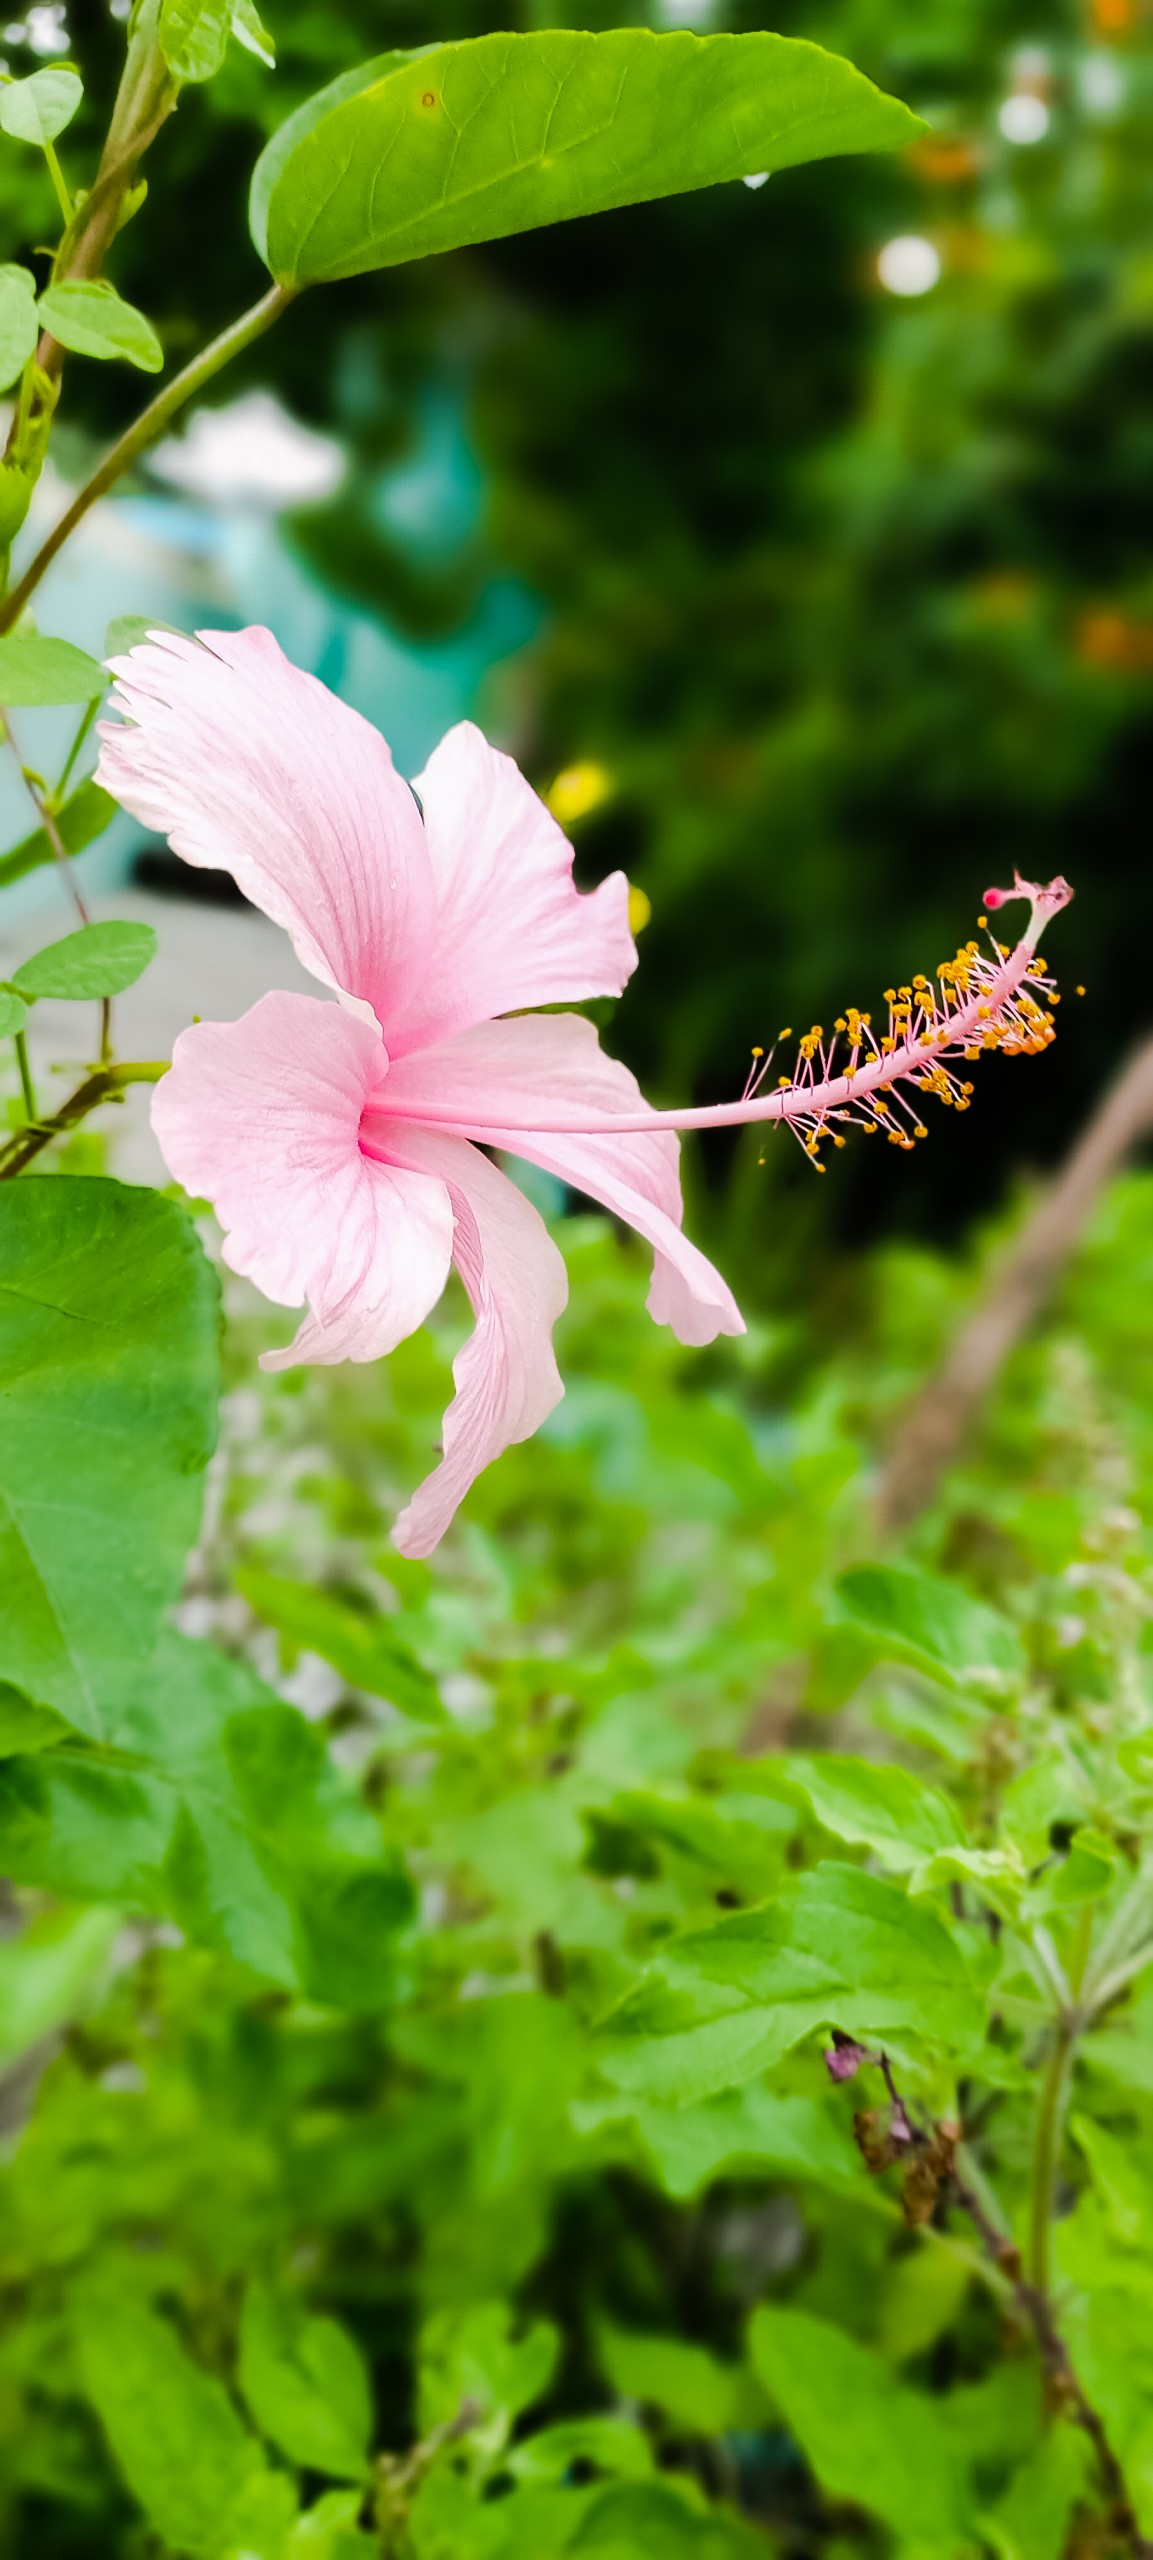 Pink Hawaiian Hibiscus Flower on Focus